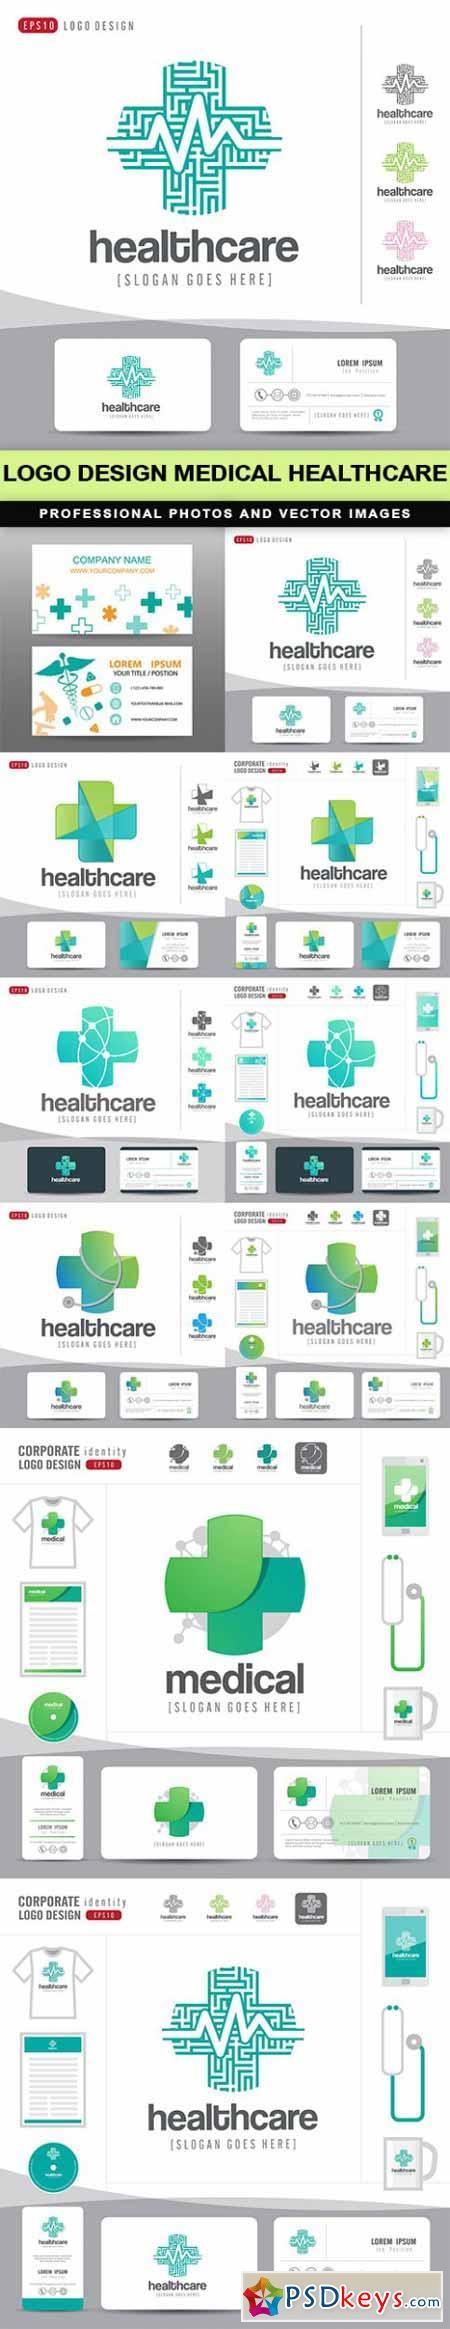 logo design medical healthcare - 10 EPS